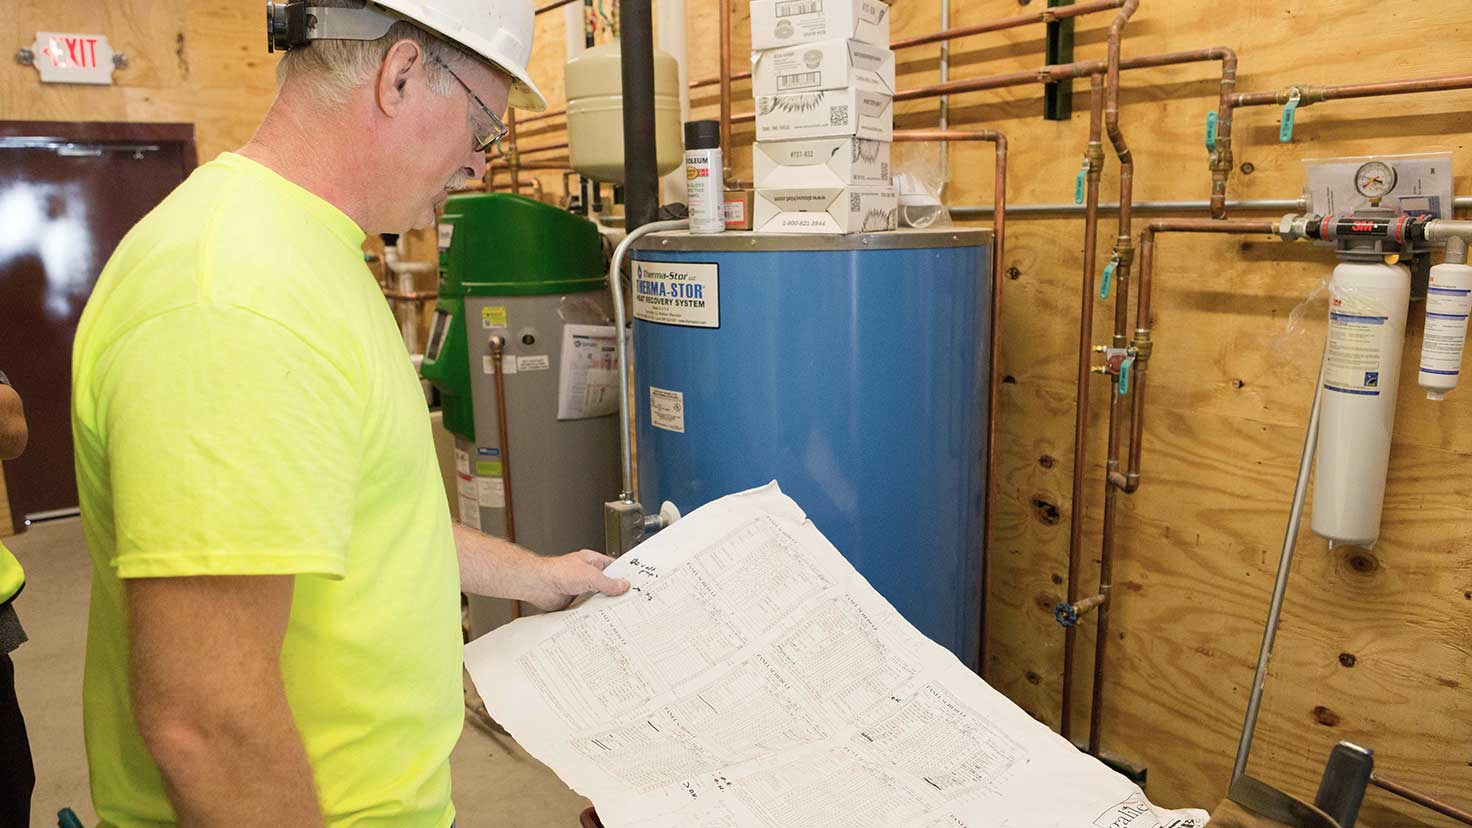 Commercial plumbing professionals